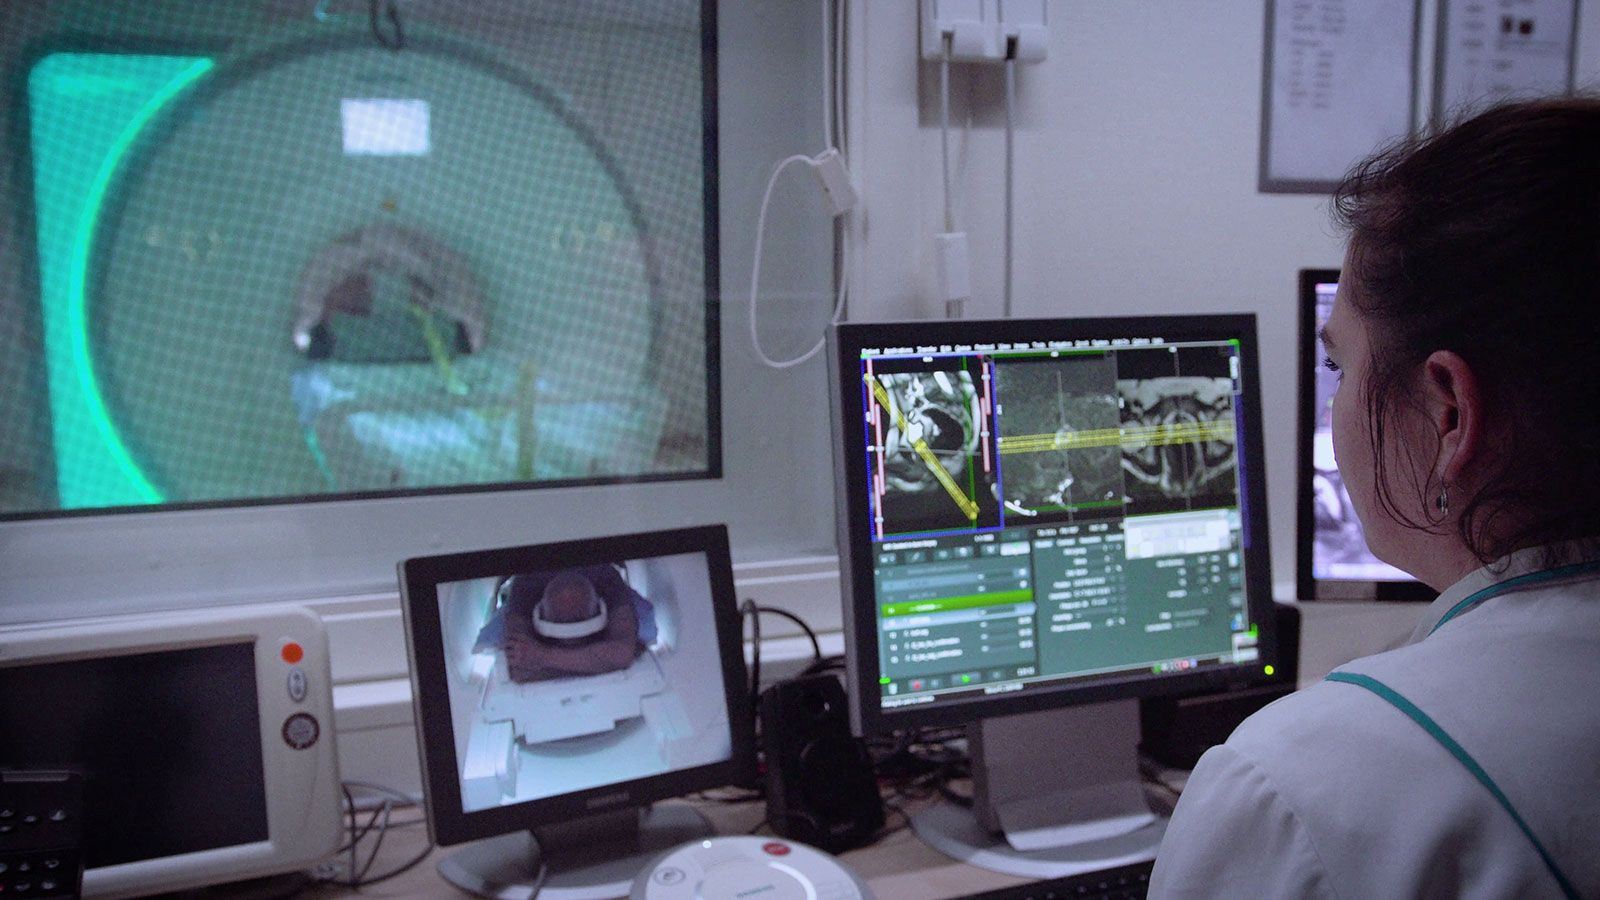 MRI videoproductie film laten maken